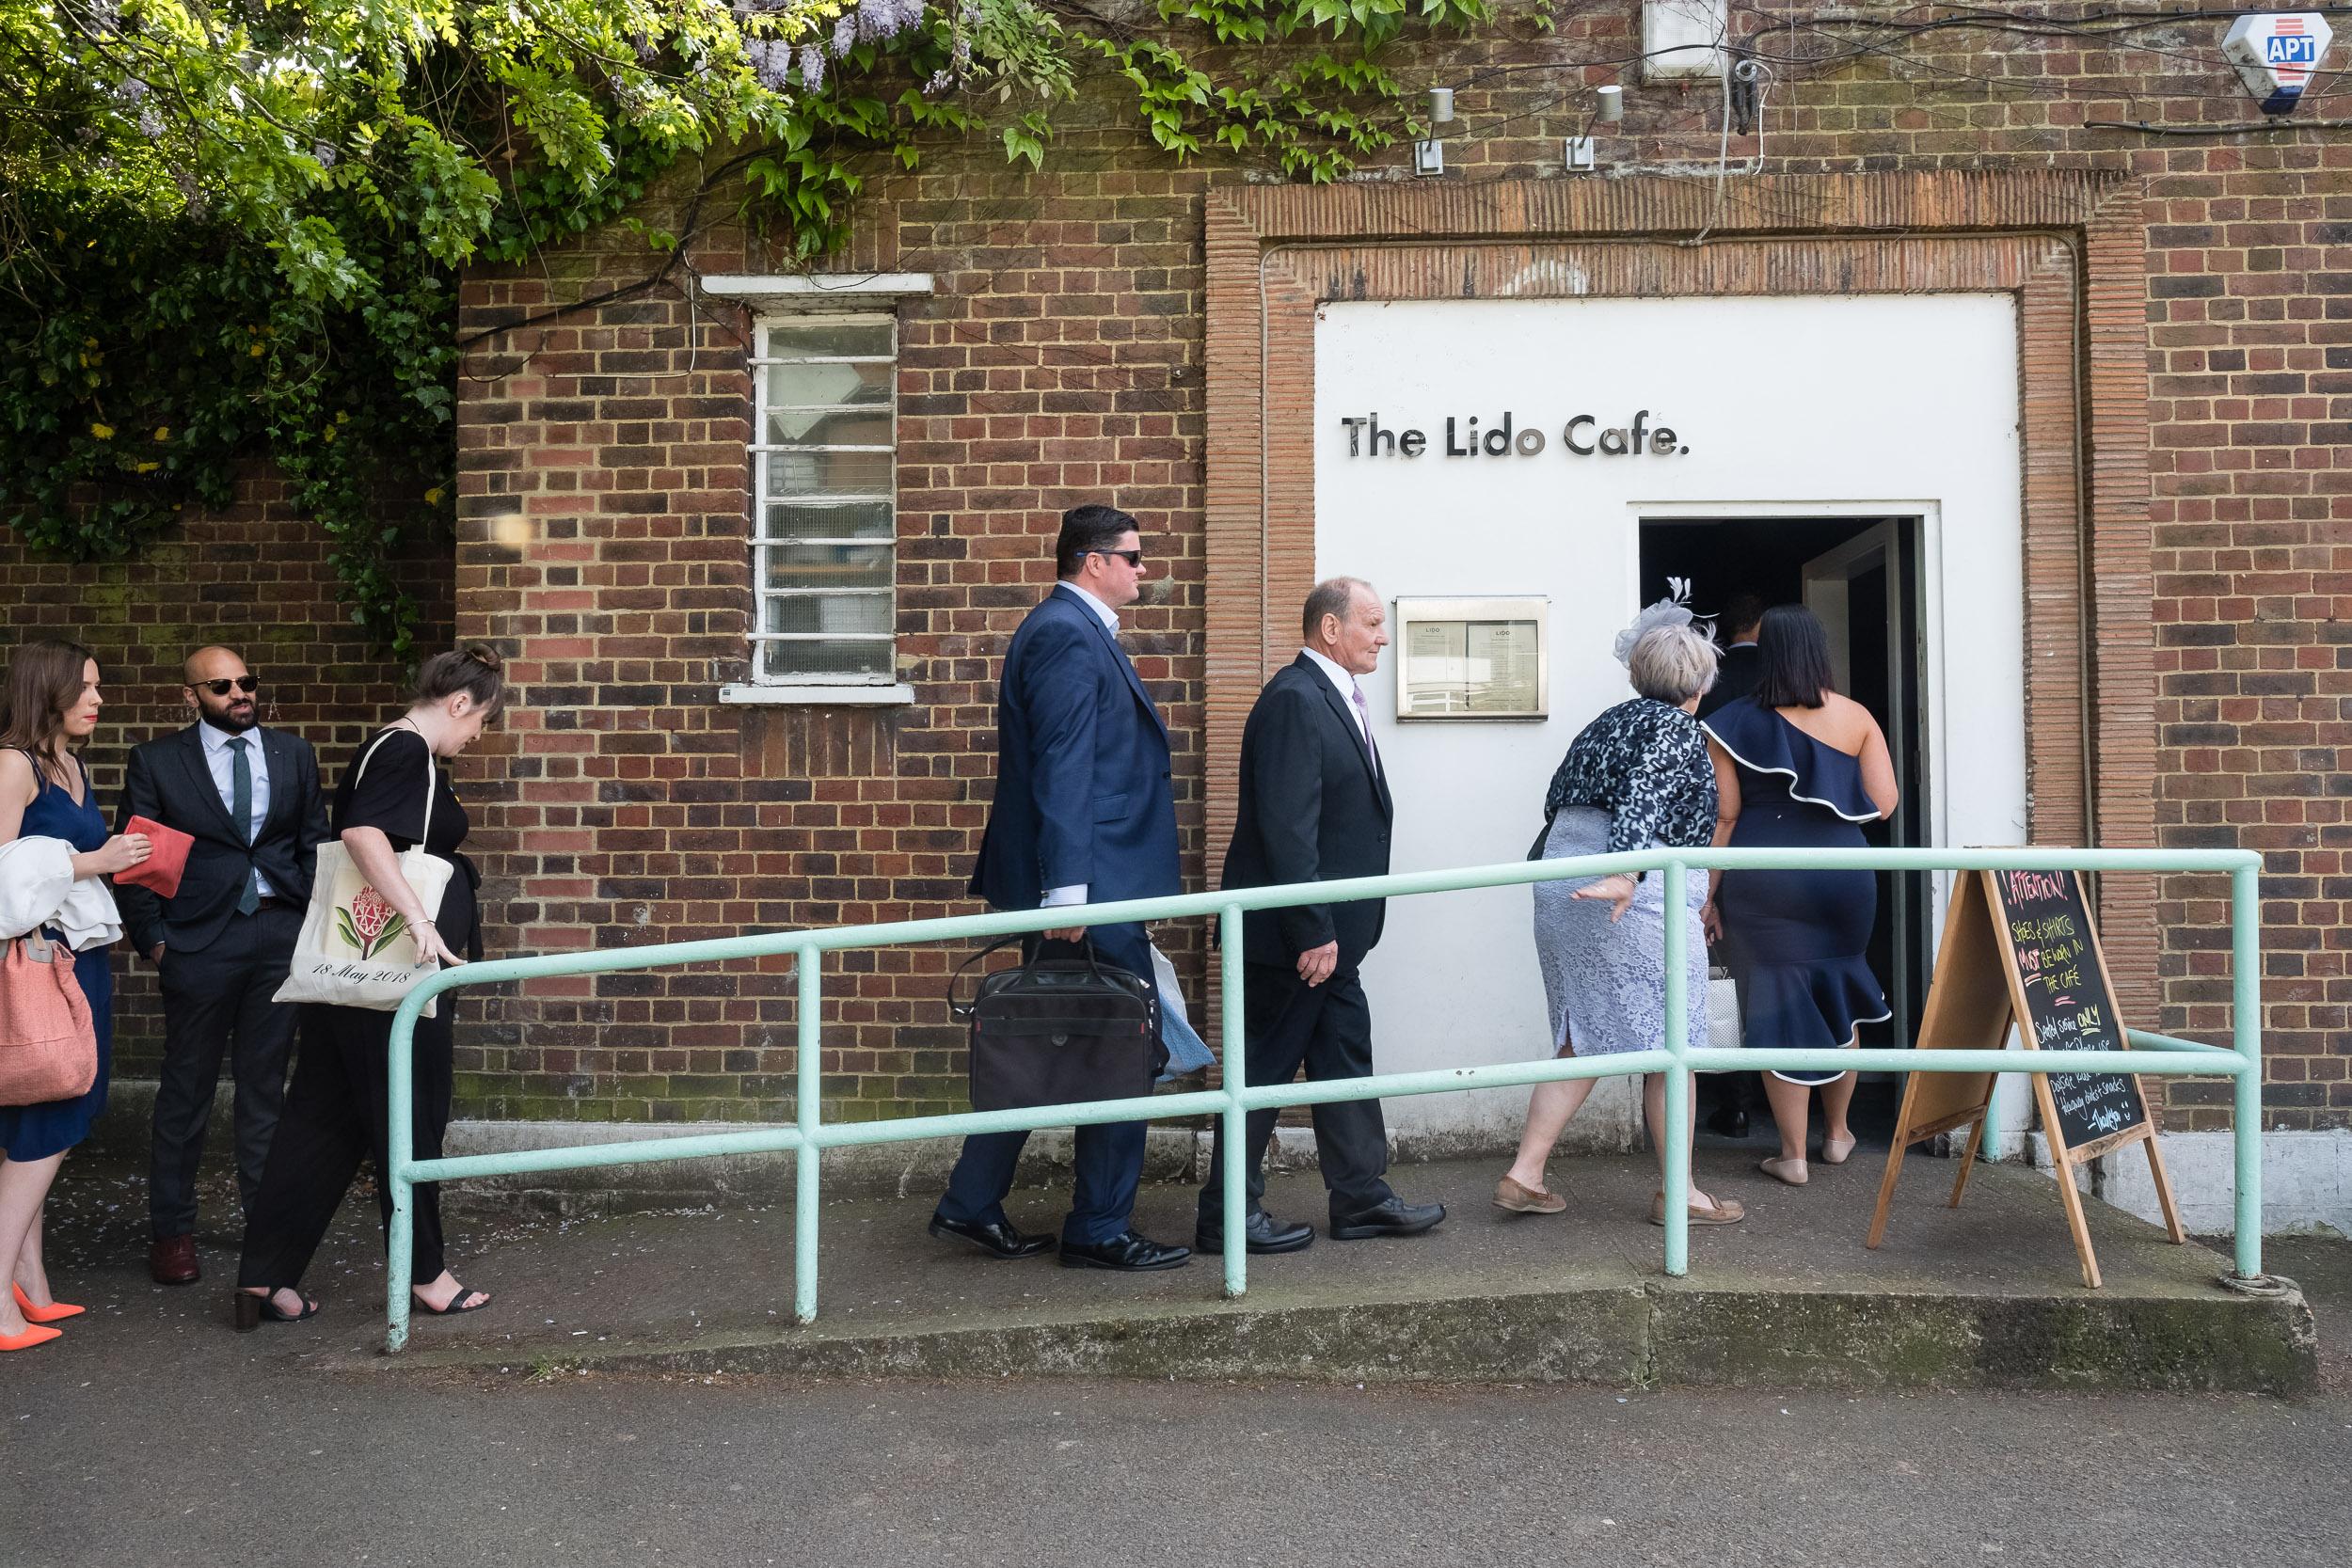 brockwell-lido-brixton-herne-hill-wedding-108.jpg